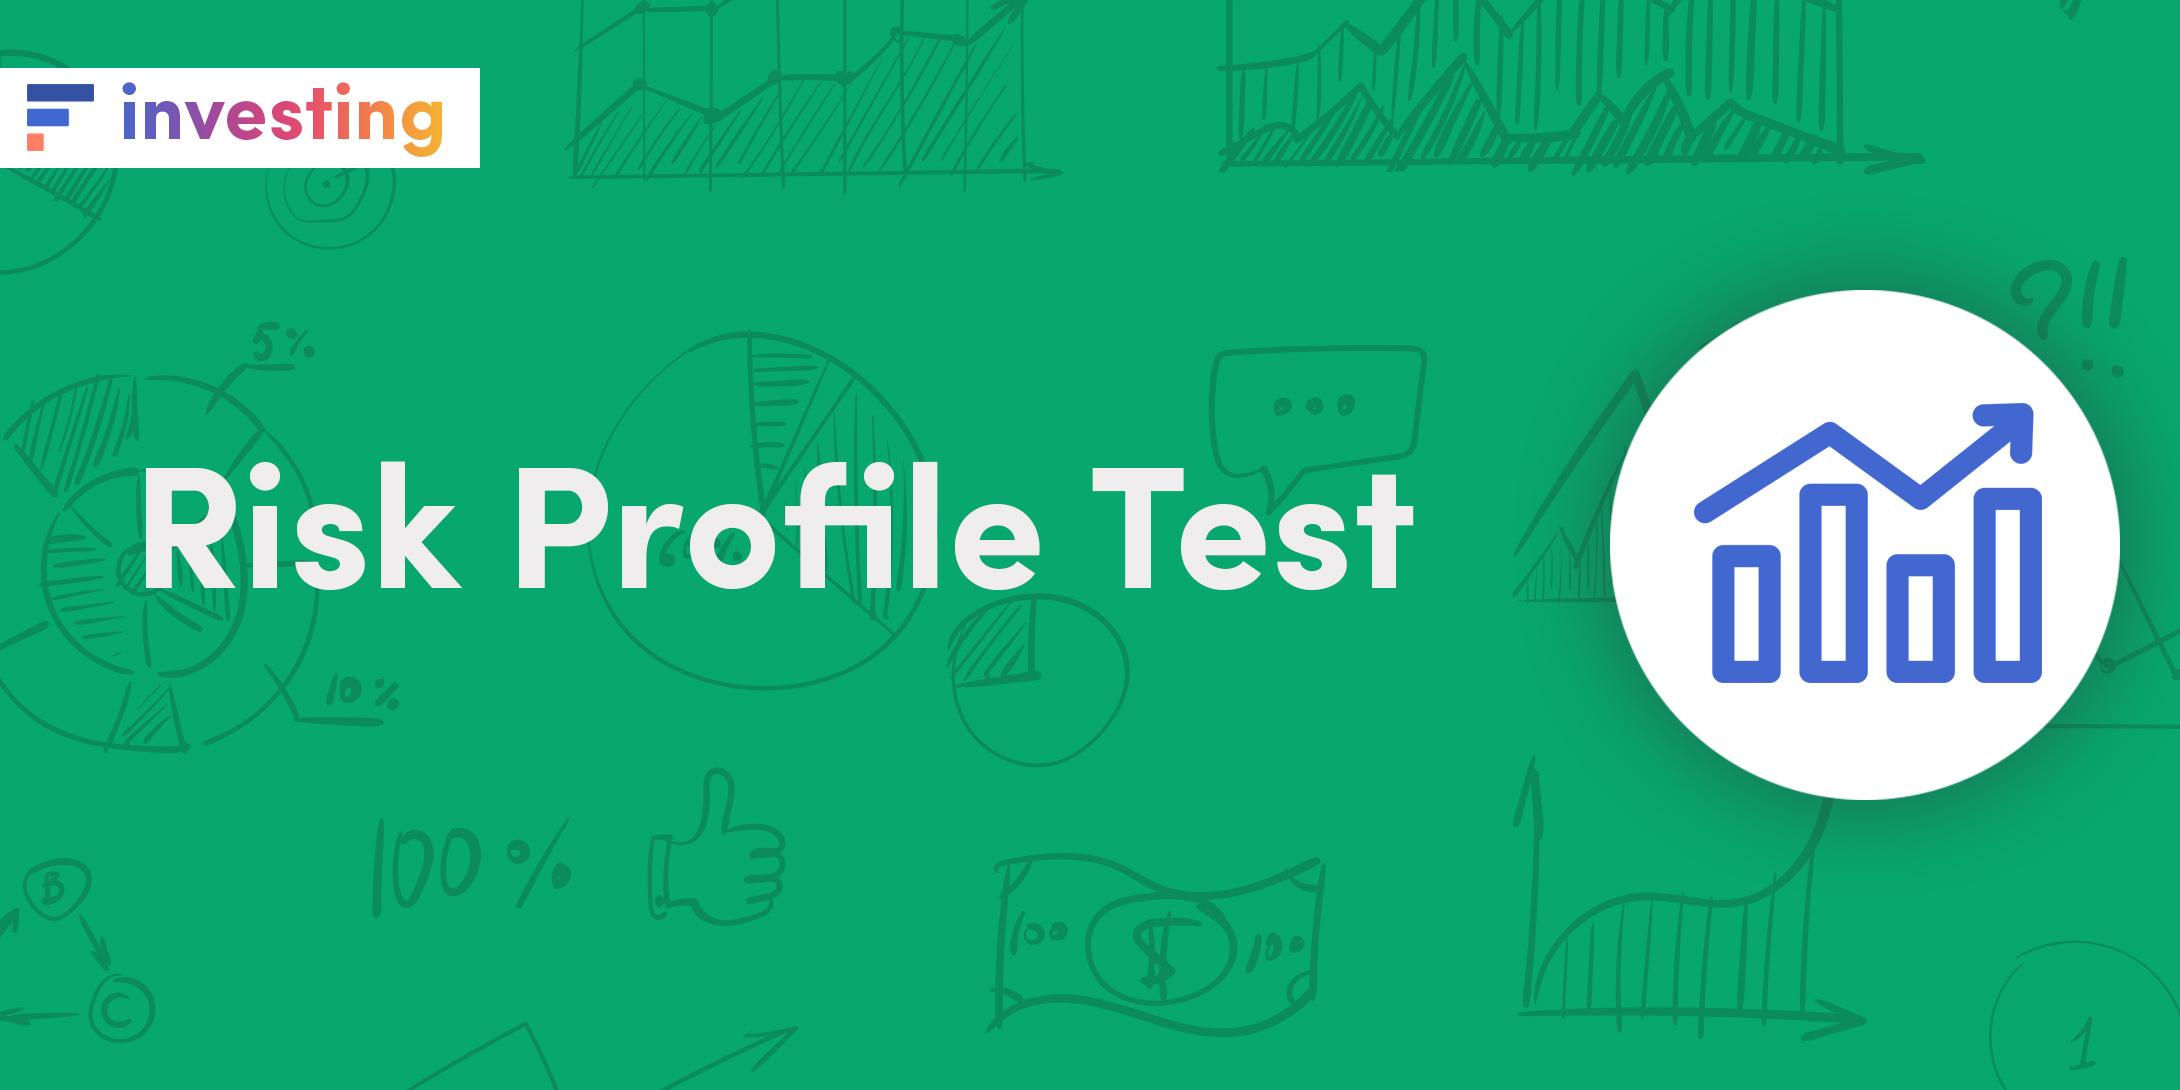 Risk profile test